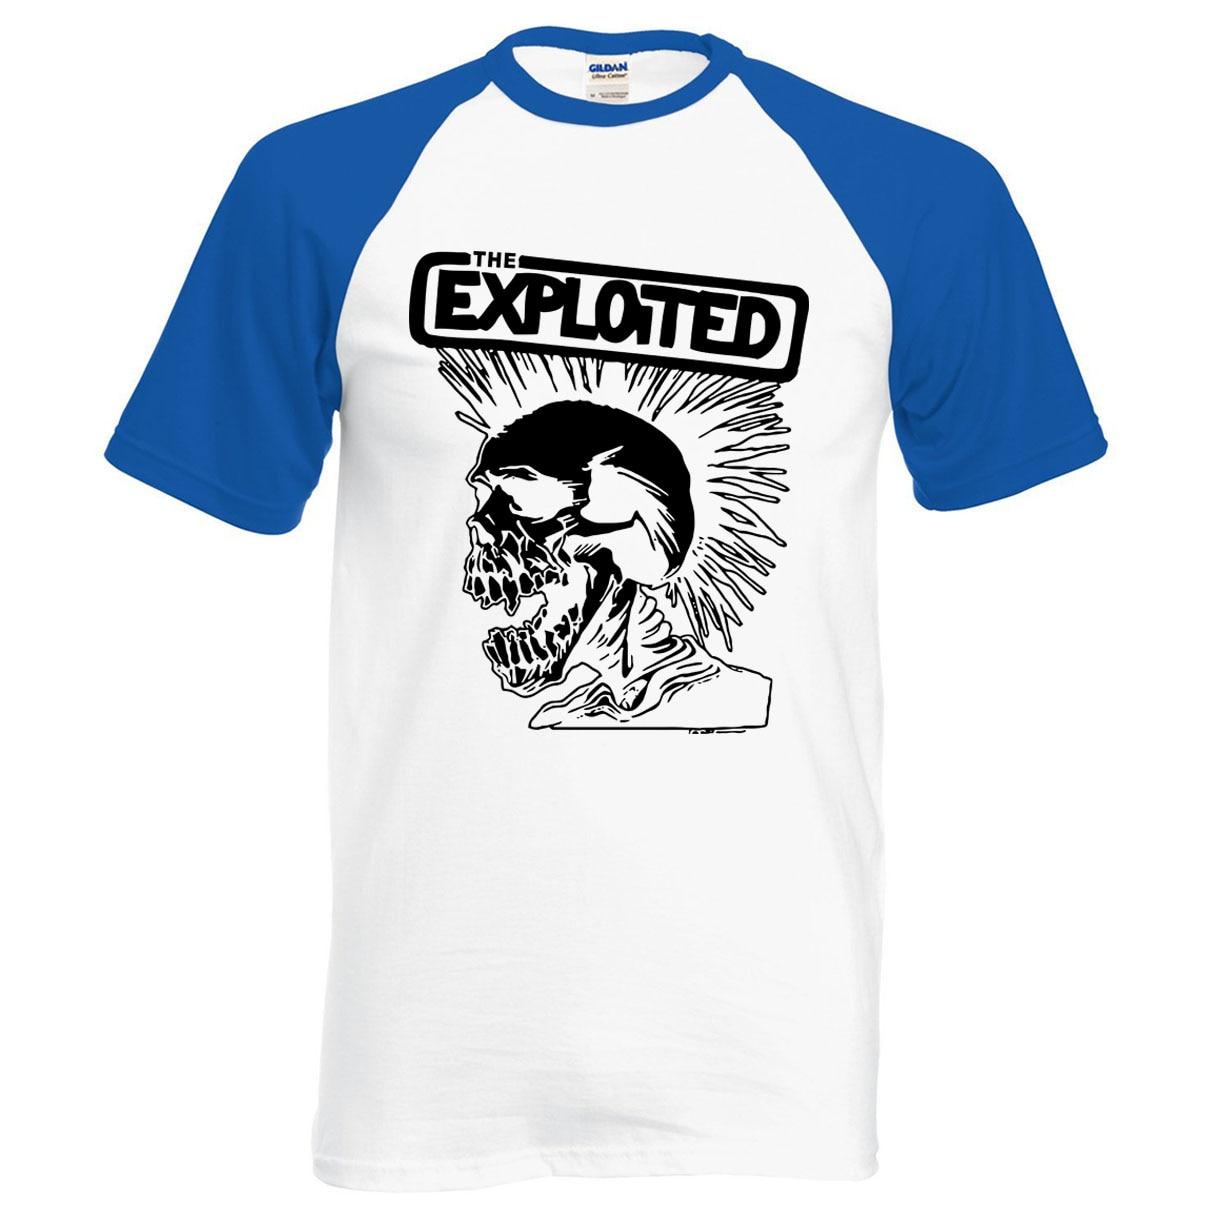 Hot Sale Punk Rock The Exploited Print 2020 New Summer 100% Cotton Skull T Shirt Fashion Raglan Men T-shirt Hipster Men S-2XL